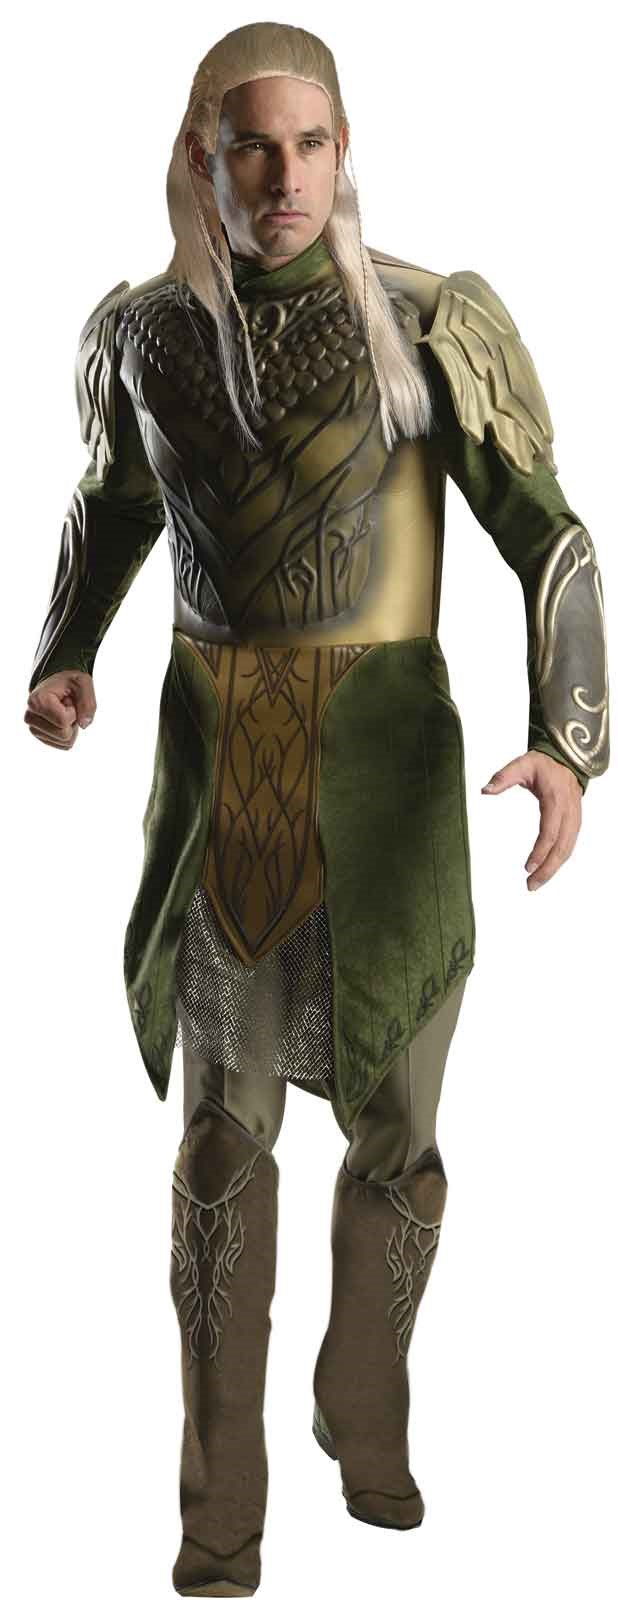 The Hobbit 2: Desolation of Smaug – Deluxe Legolas Elf Costume